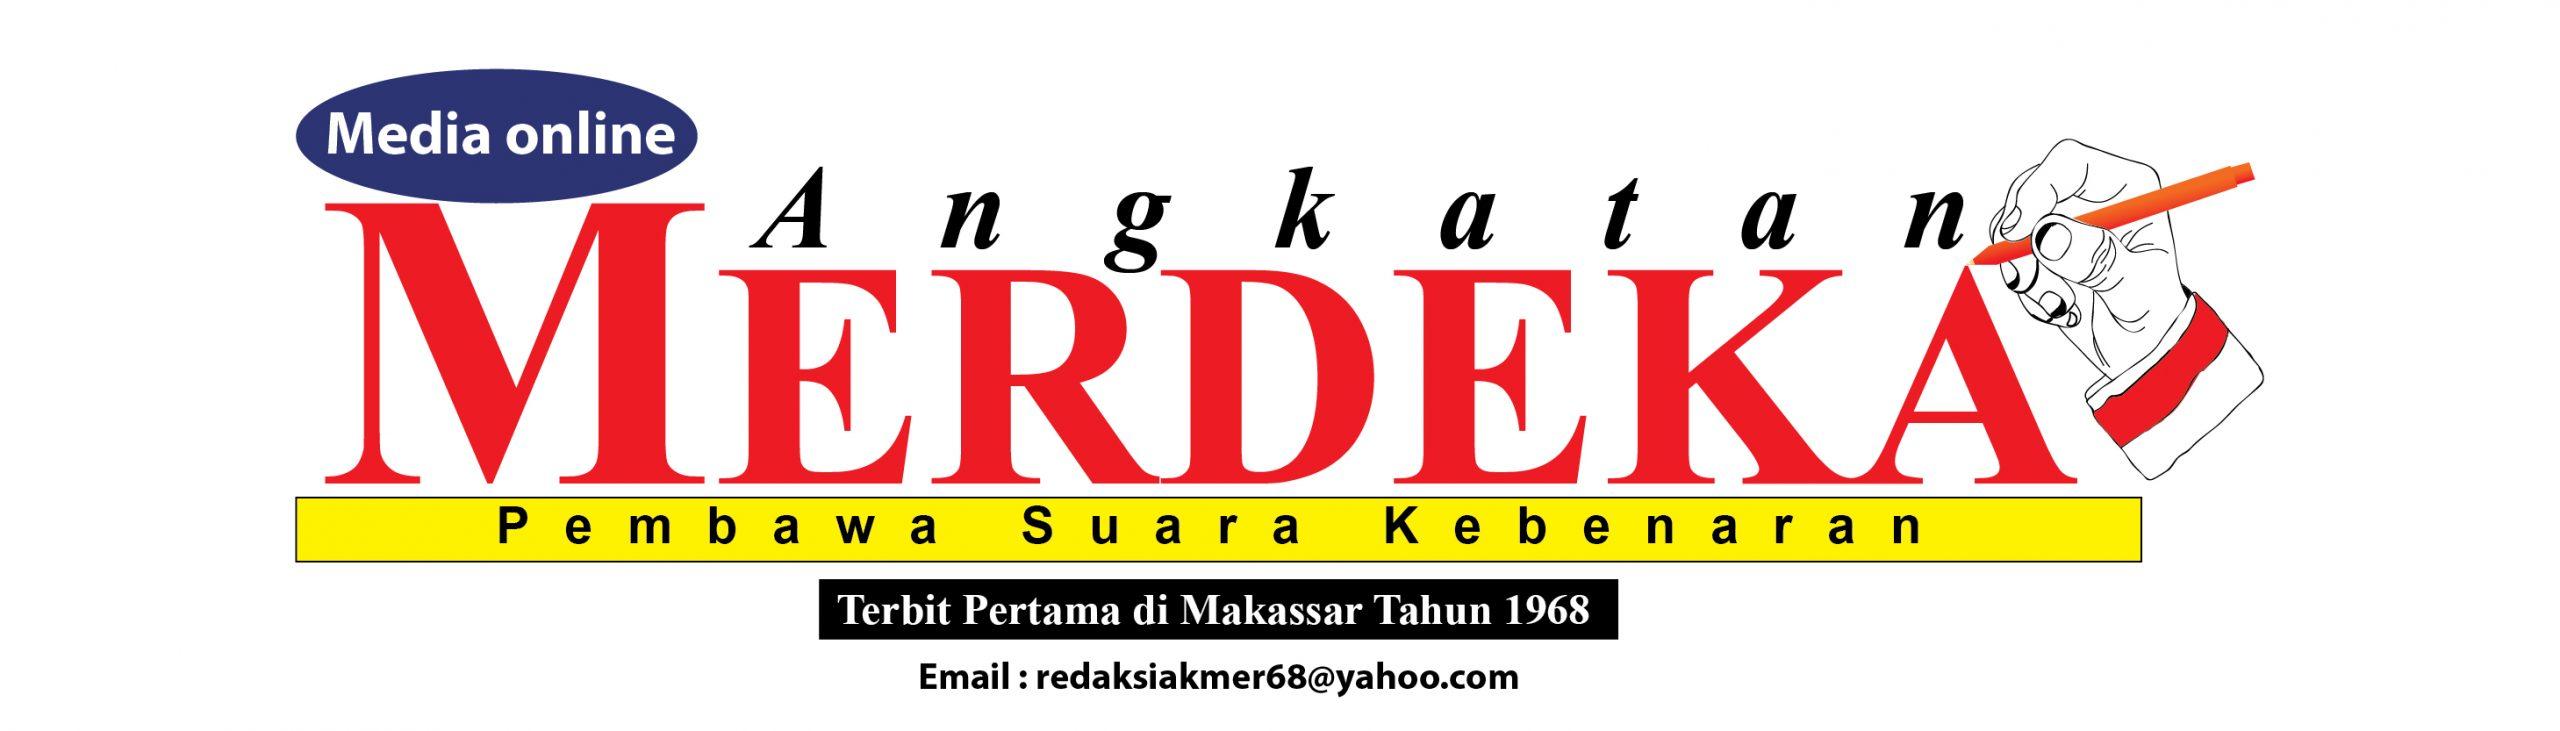 Terbit Pertama di Makassar Tahun 1968